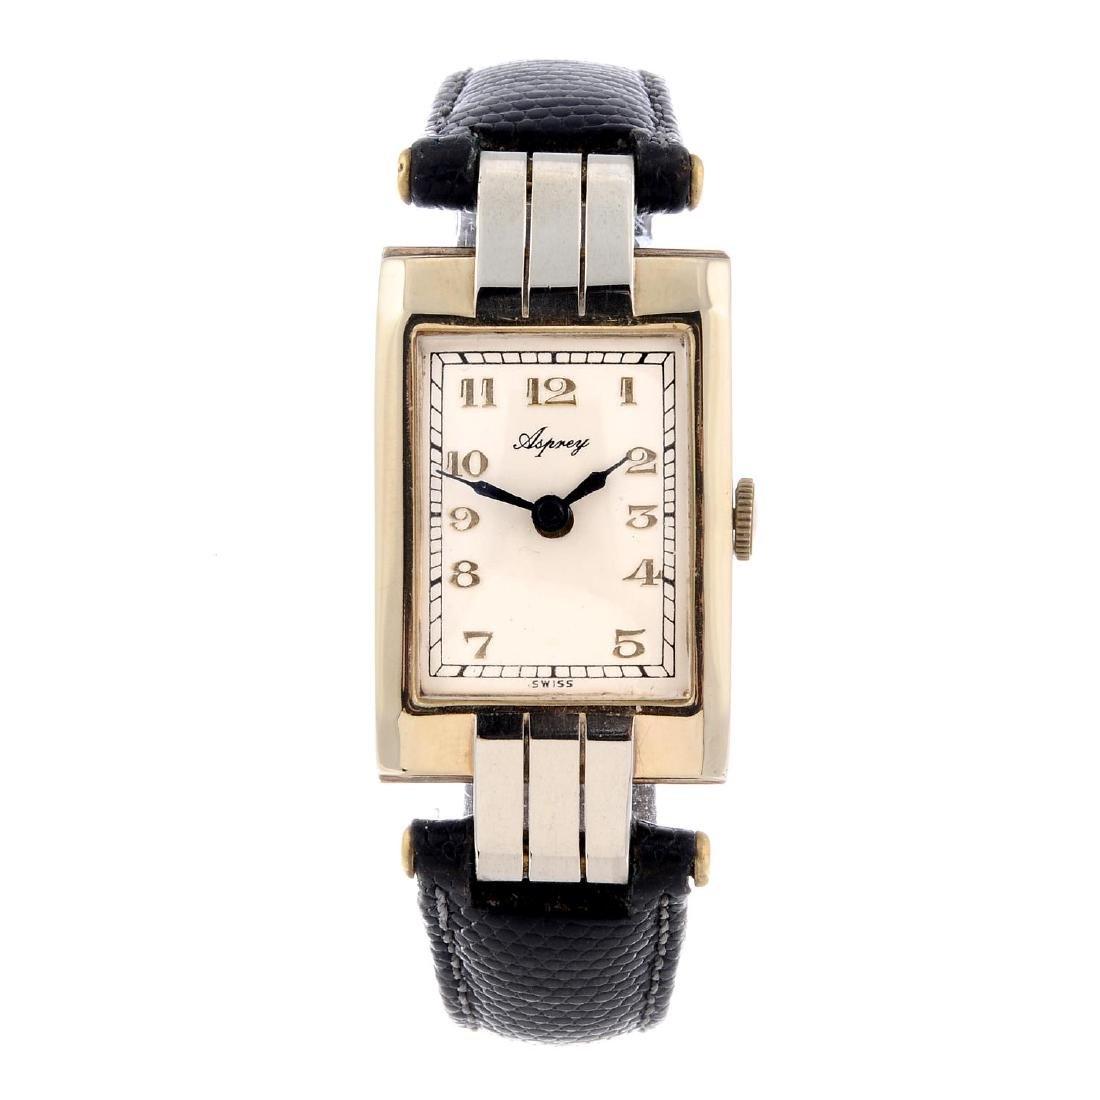 ASPREY - a gentleman's wrist watch. 9ct yellow gold